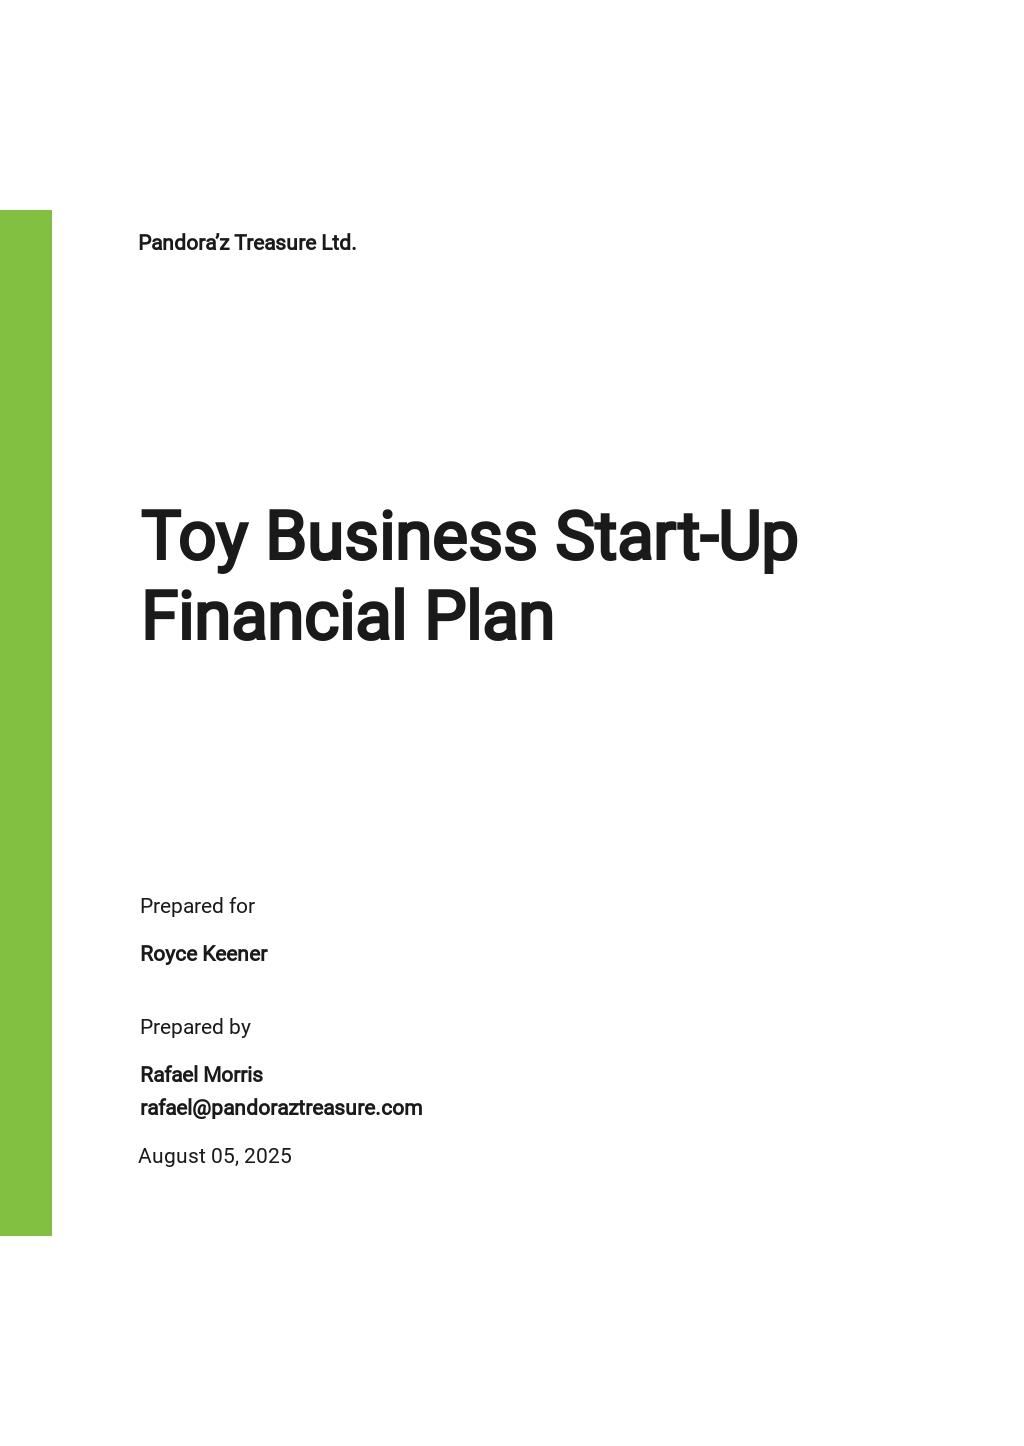 Financial Plan For Start-Up Business Template